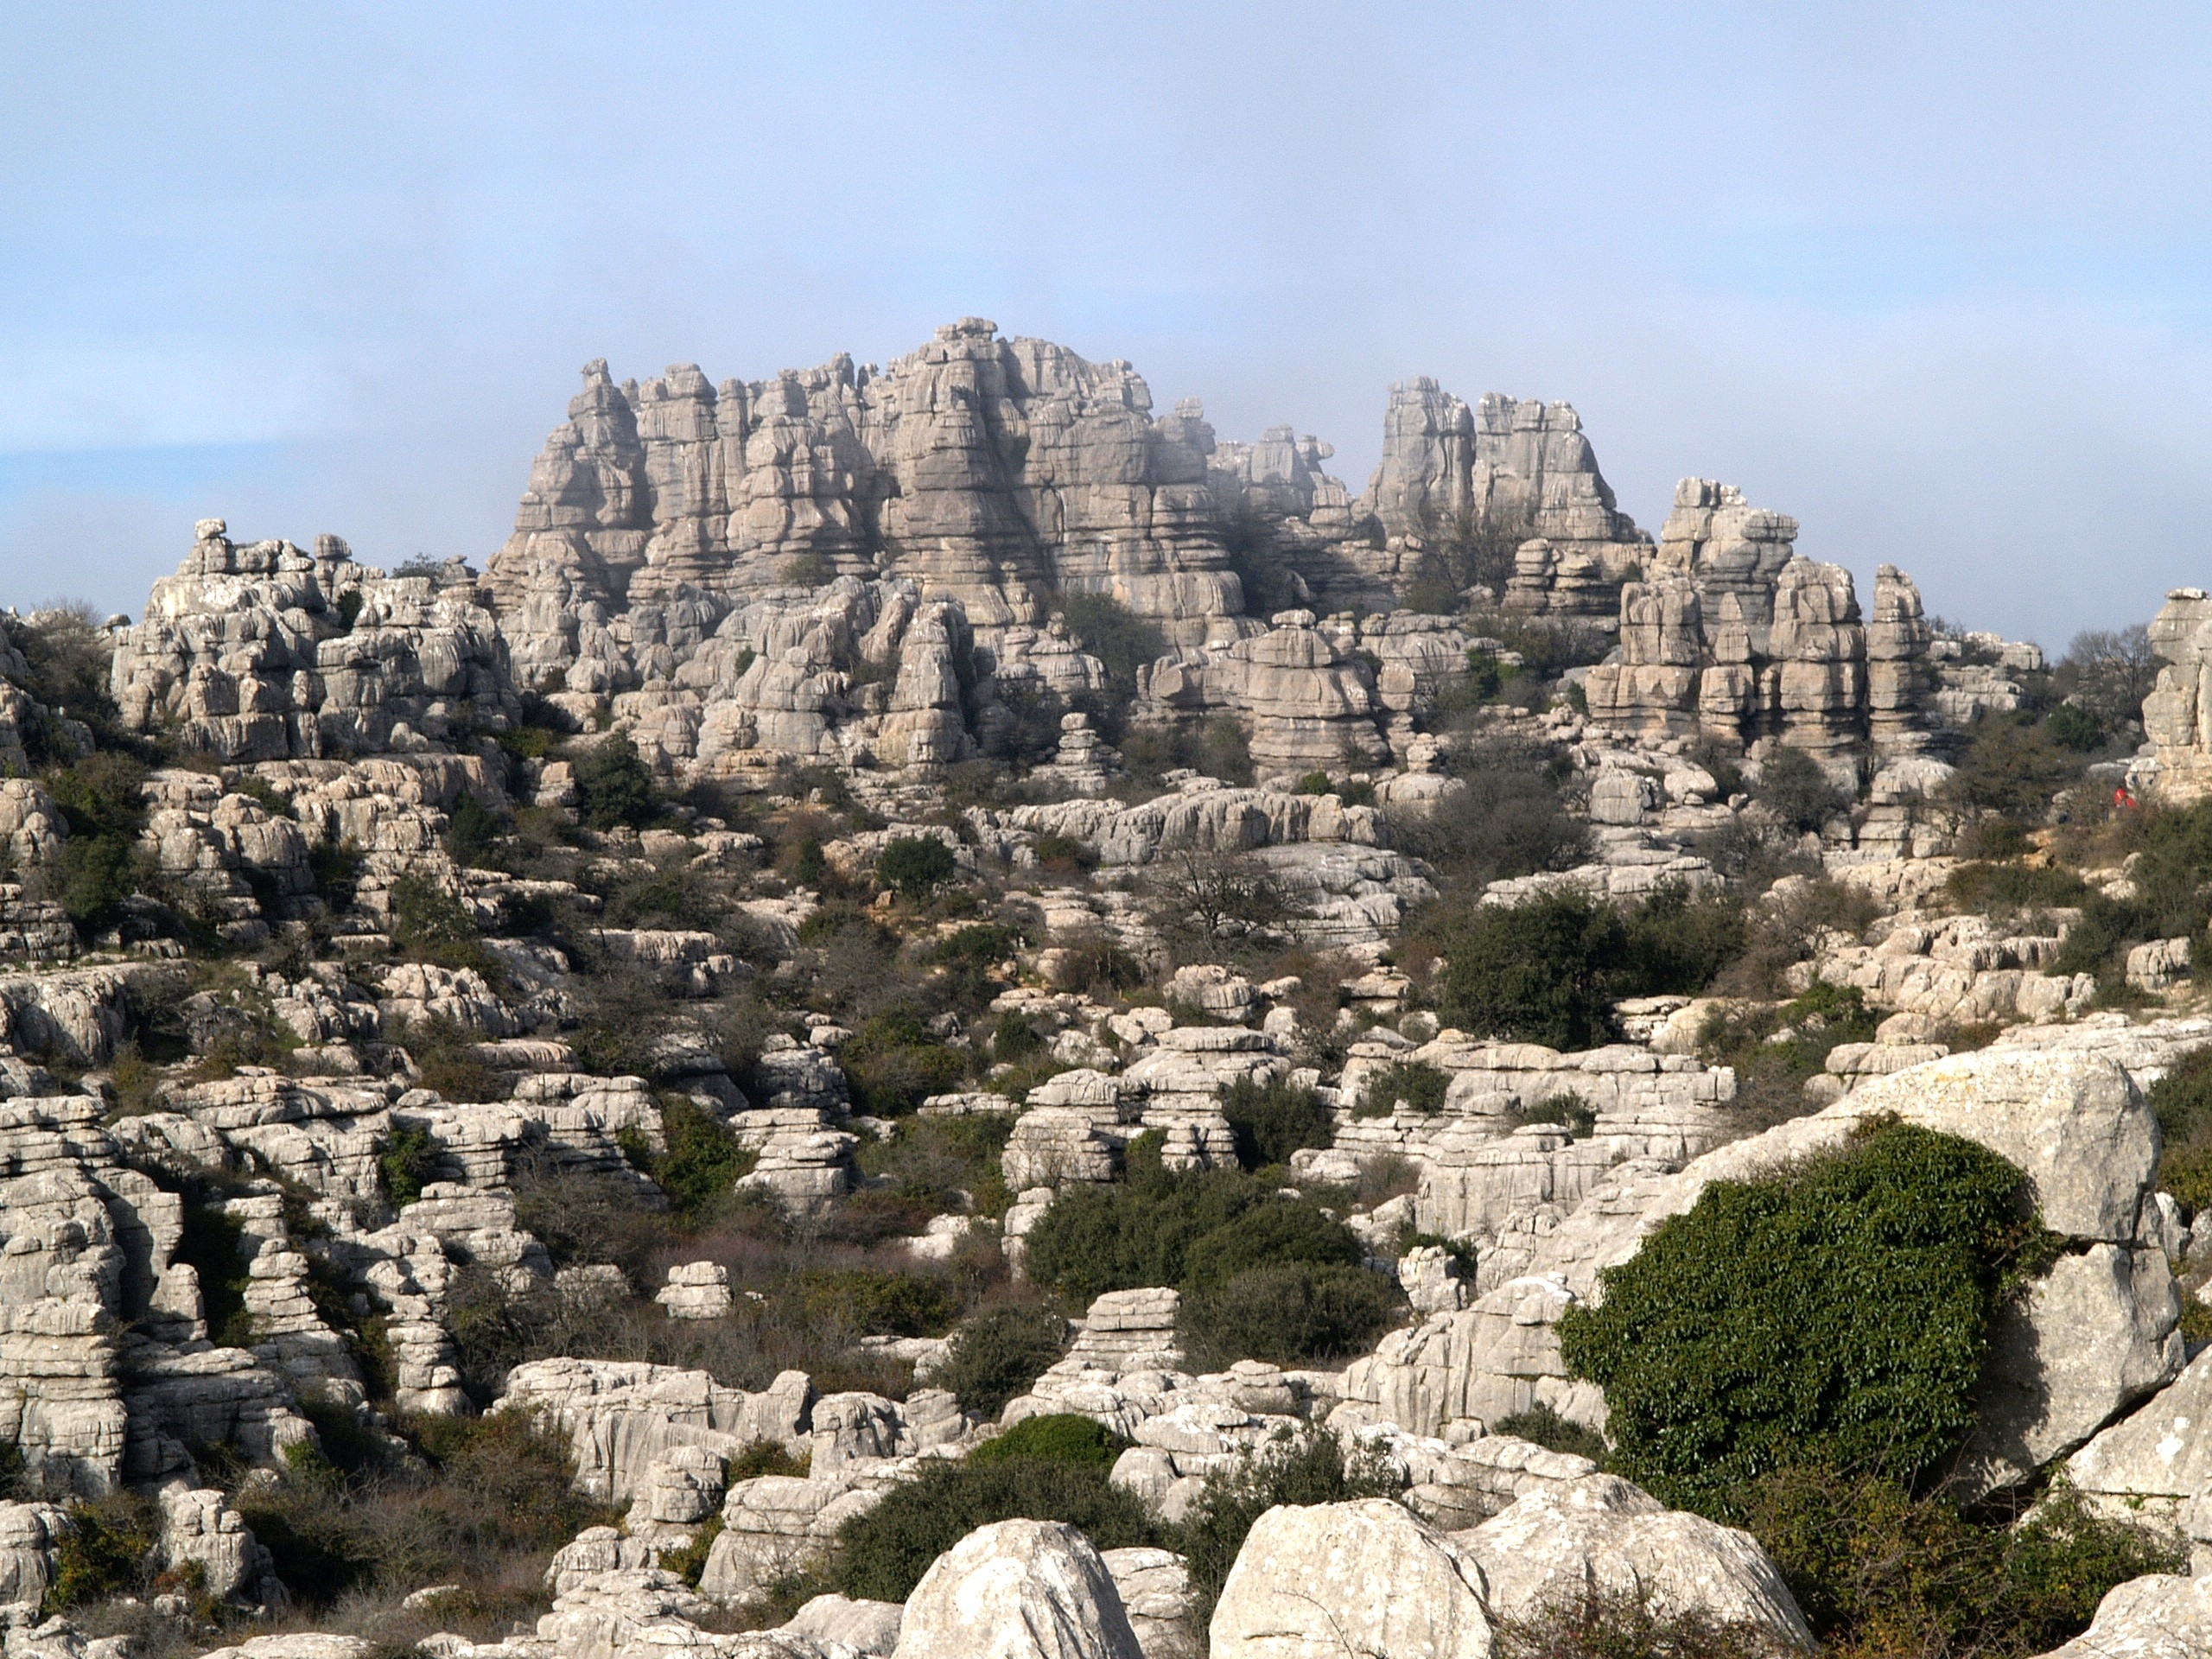 Antequera Dolmens Site: El Torcal de Antequera